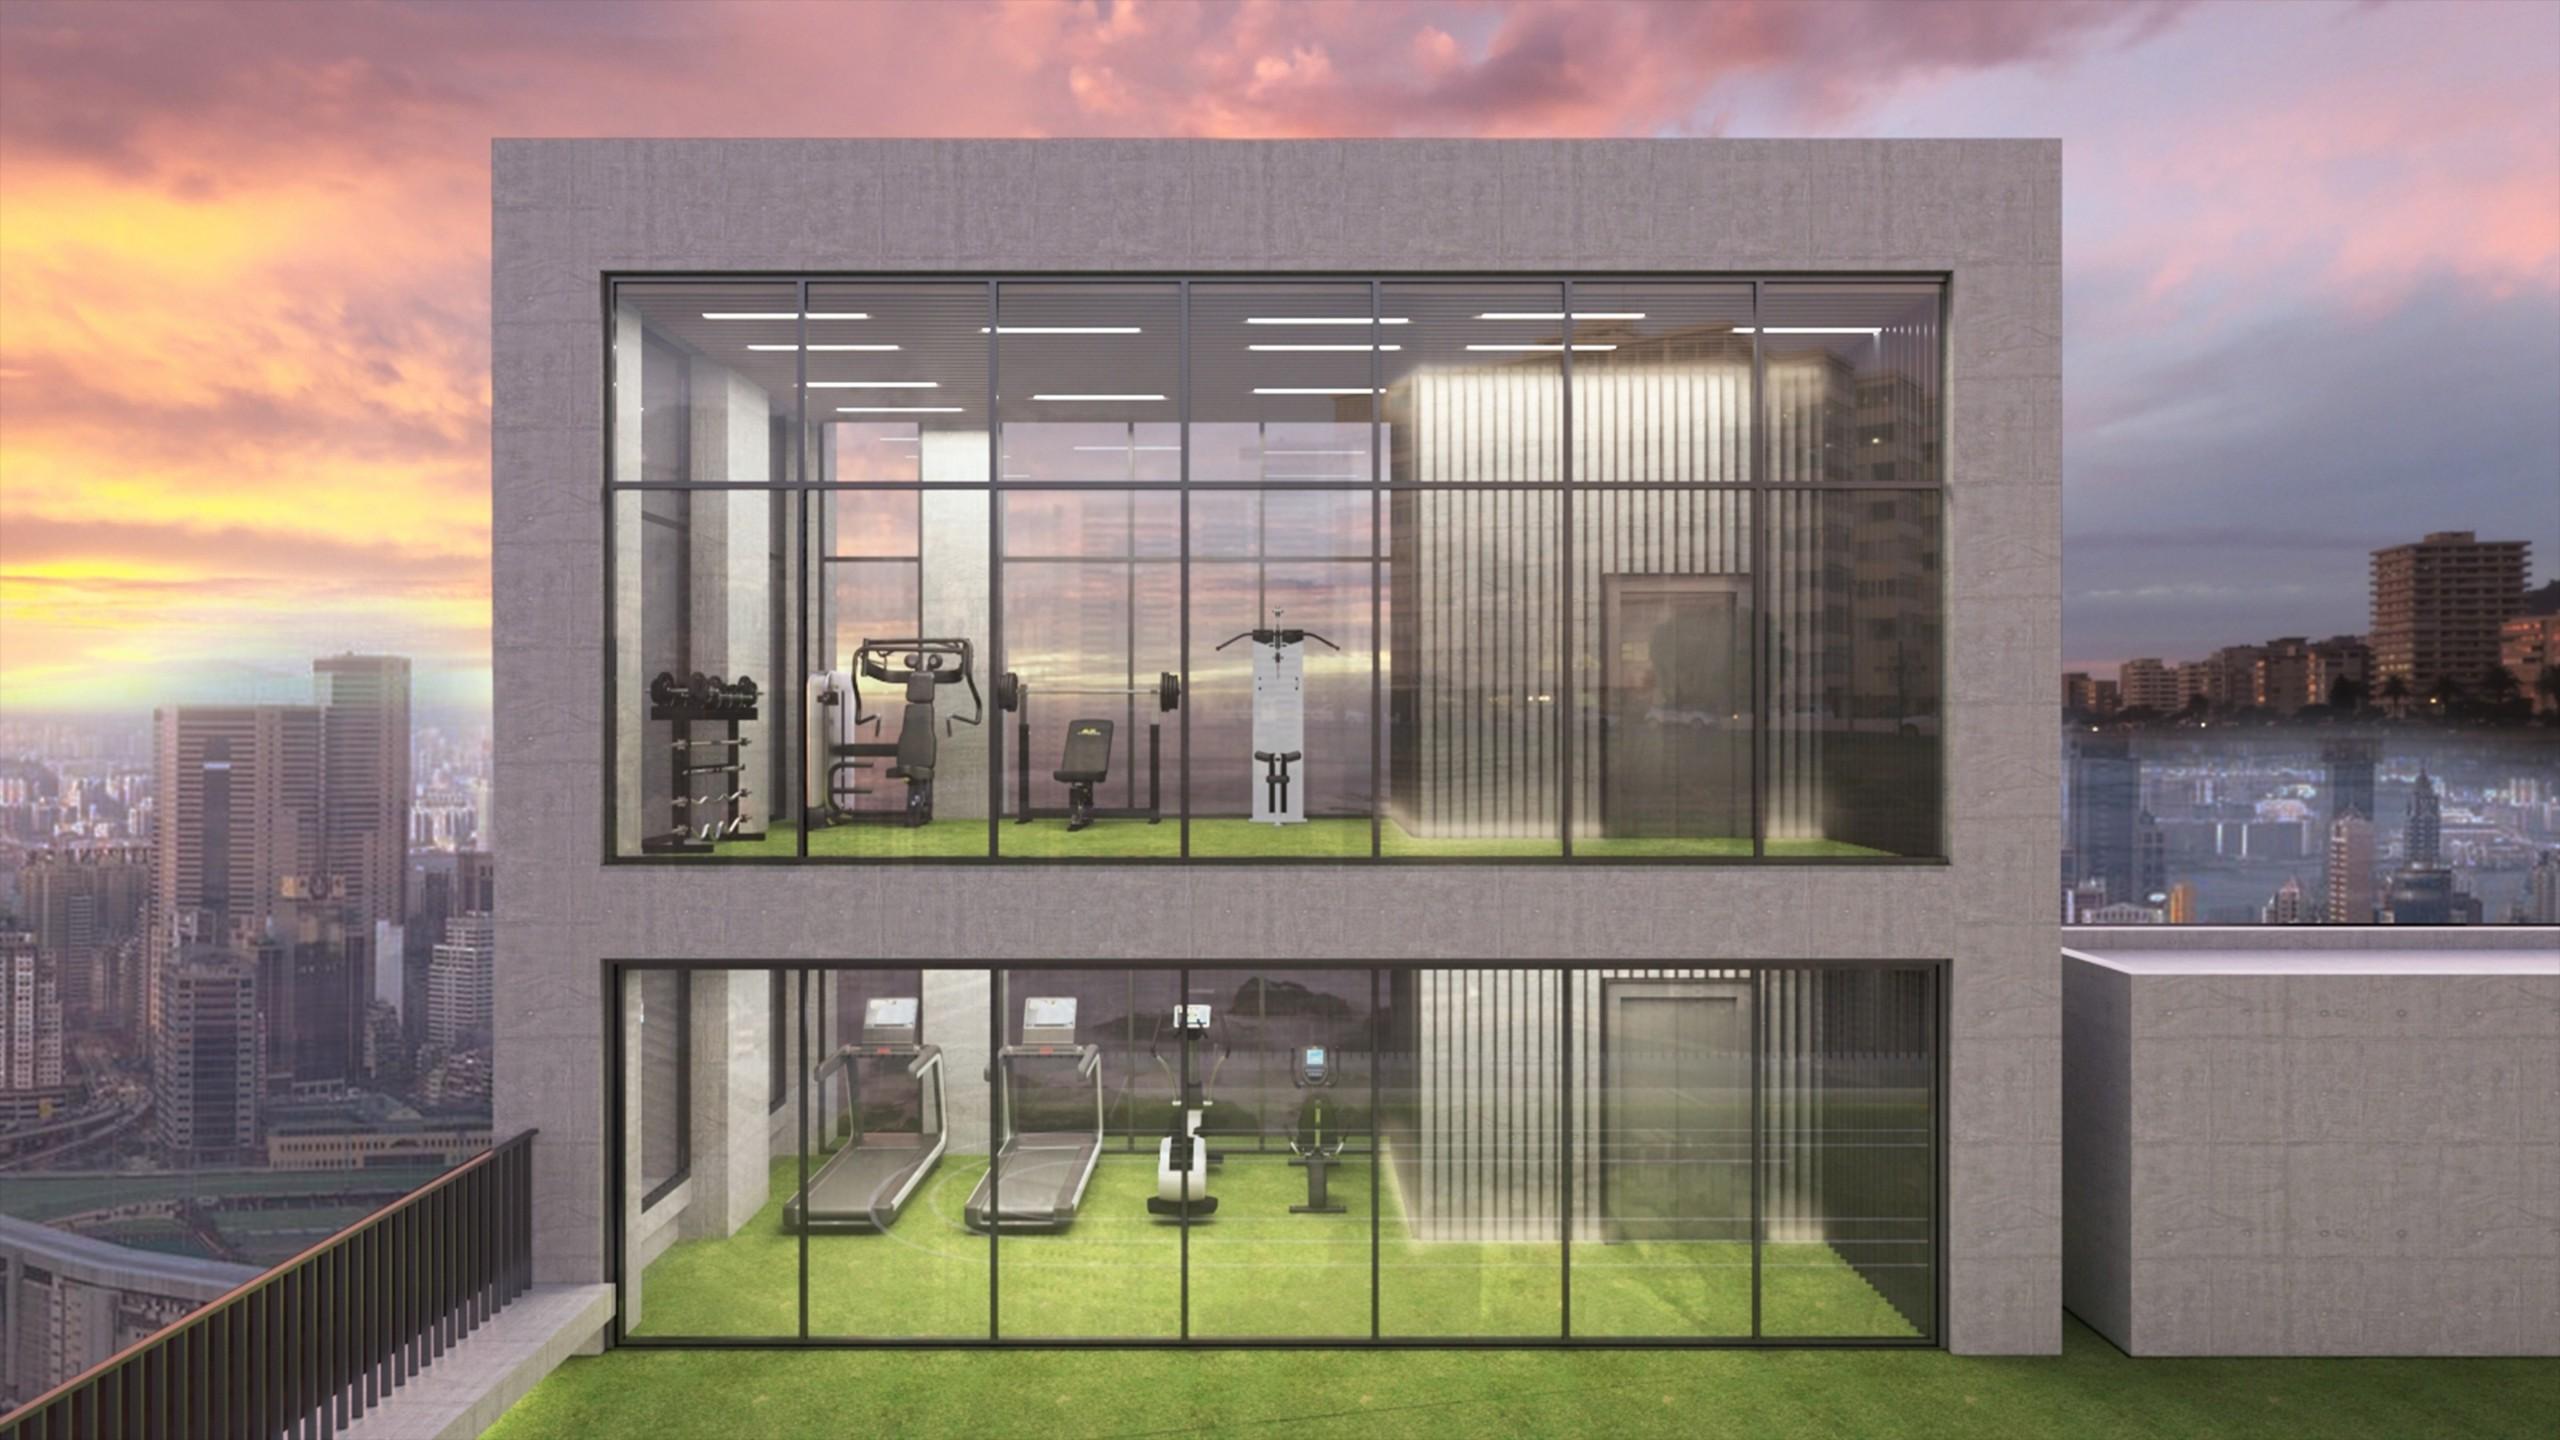 德築-DEZU-project-林口十現-architecture-building-3Drendering-4